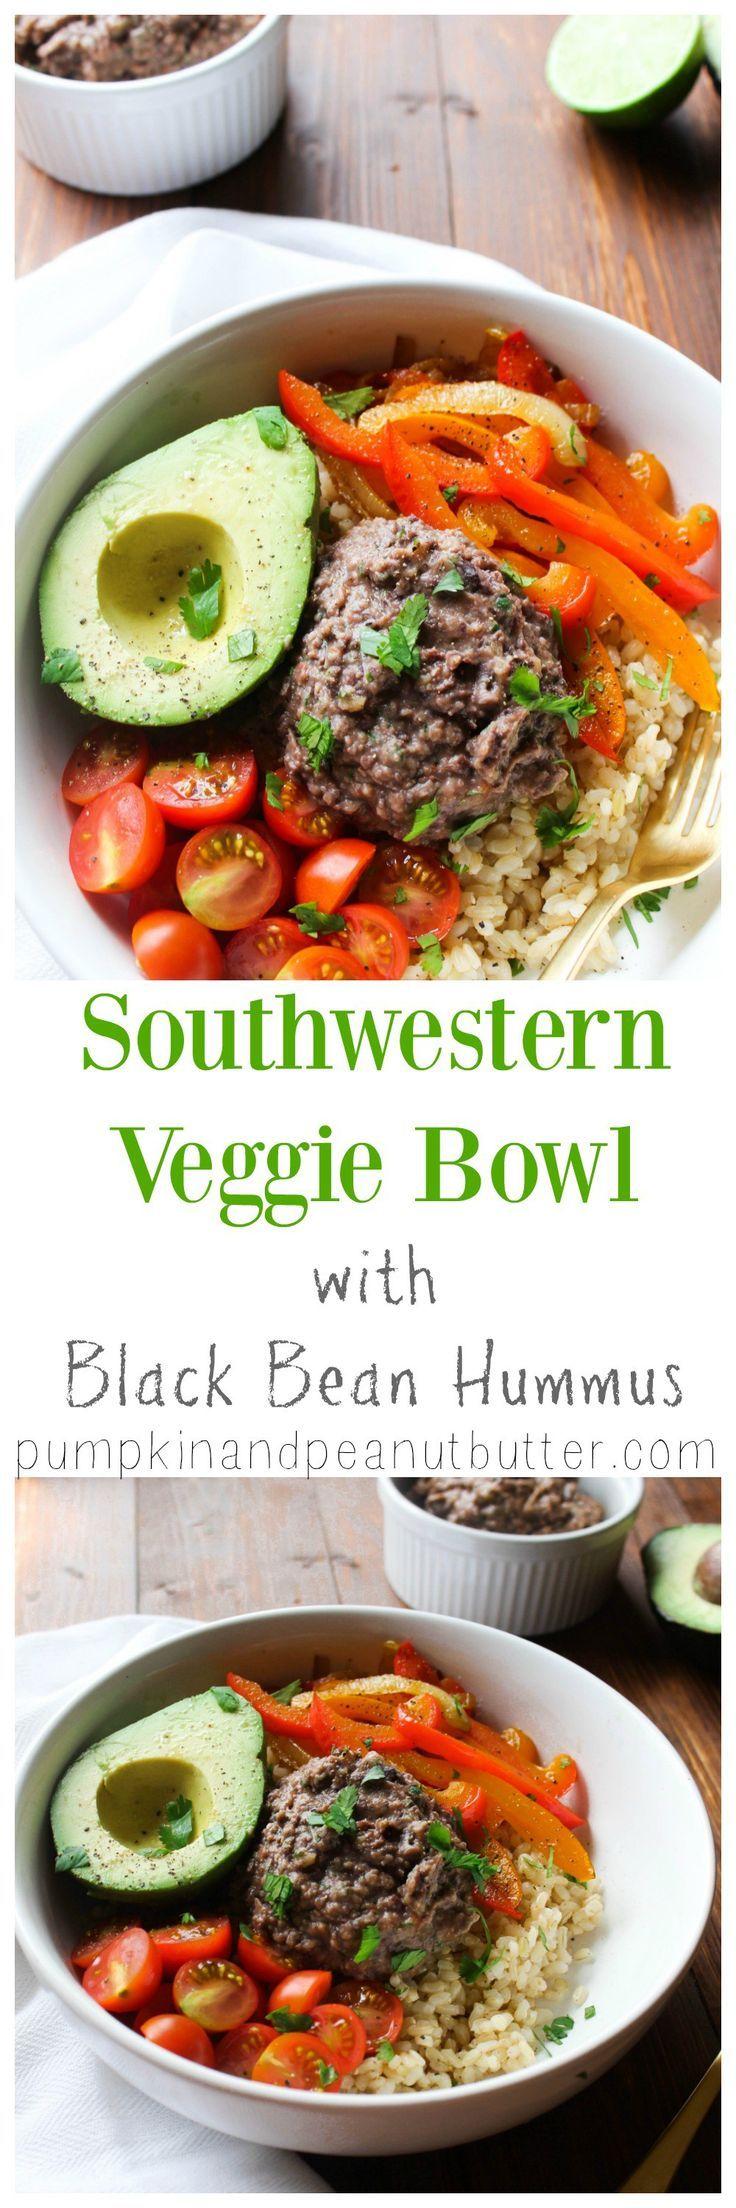 Southwestern Veggie Bowl with Black Bean Hummus {vegan, gluten free} // pumpkin & peanut butter